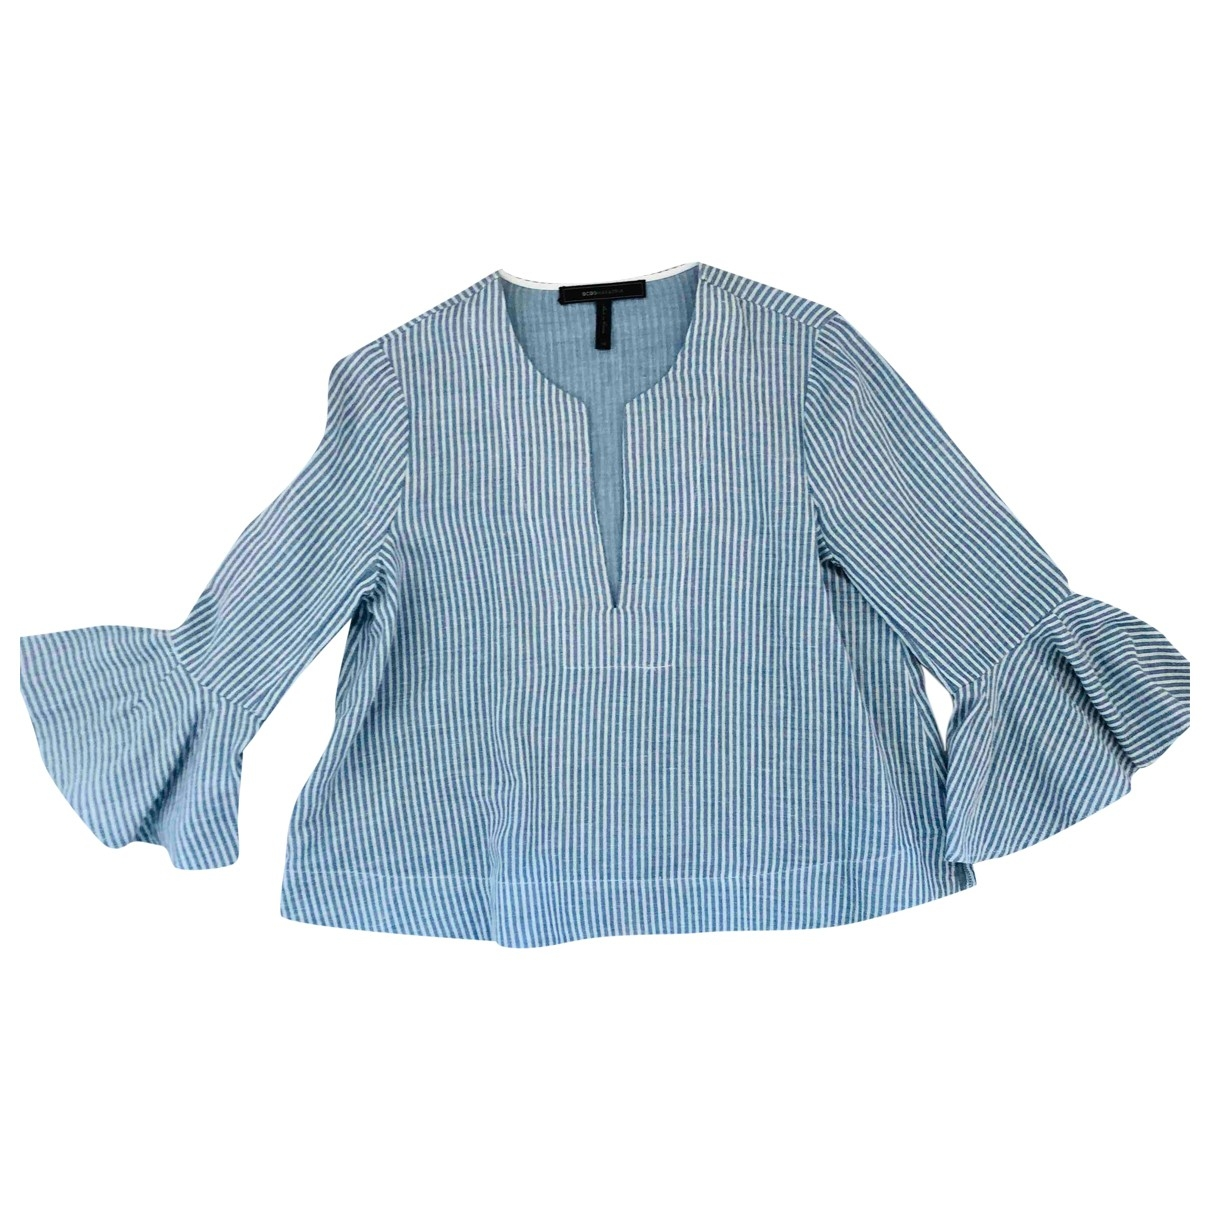 Bcbg Max Azria \N Blue Cotton  top for Women XS International